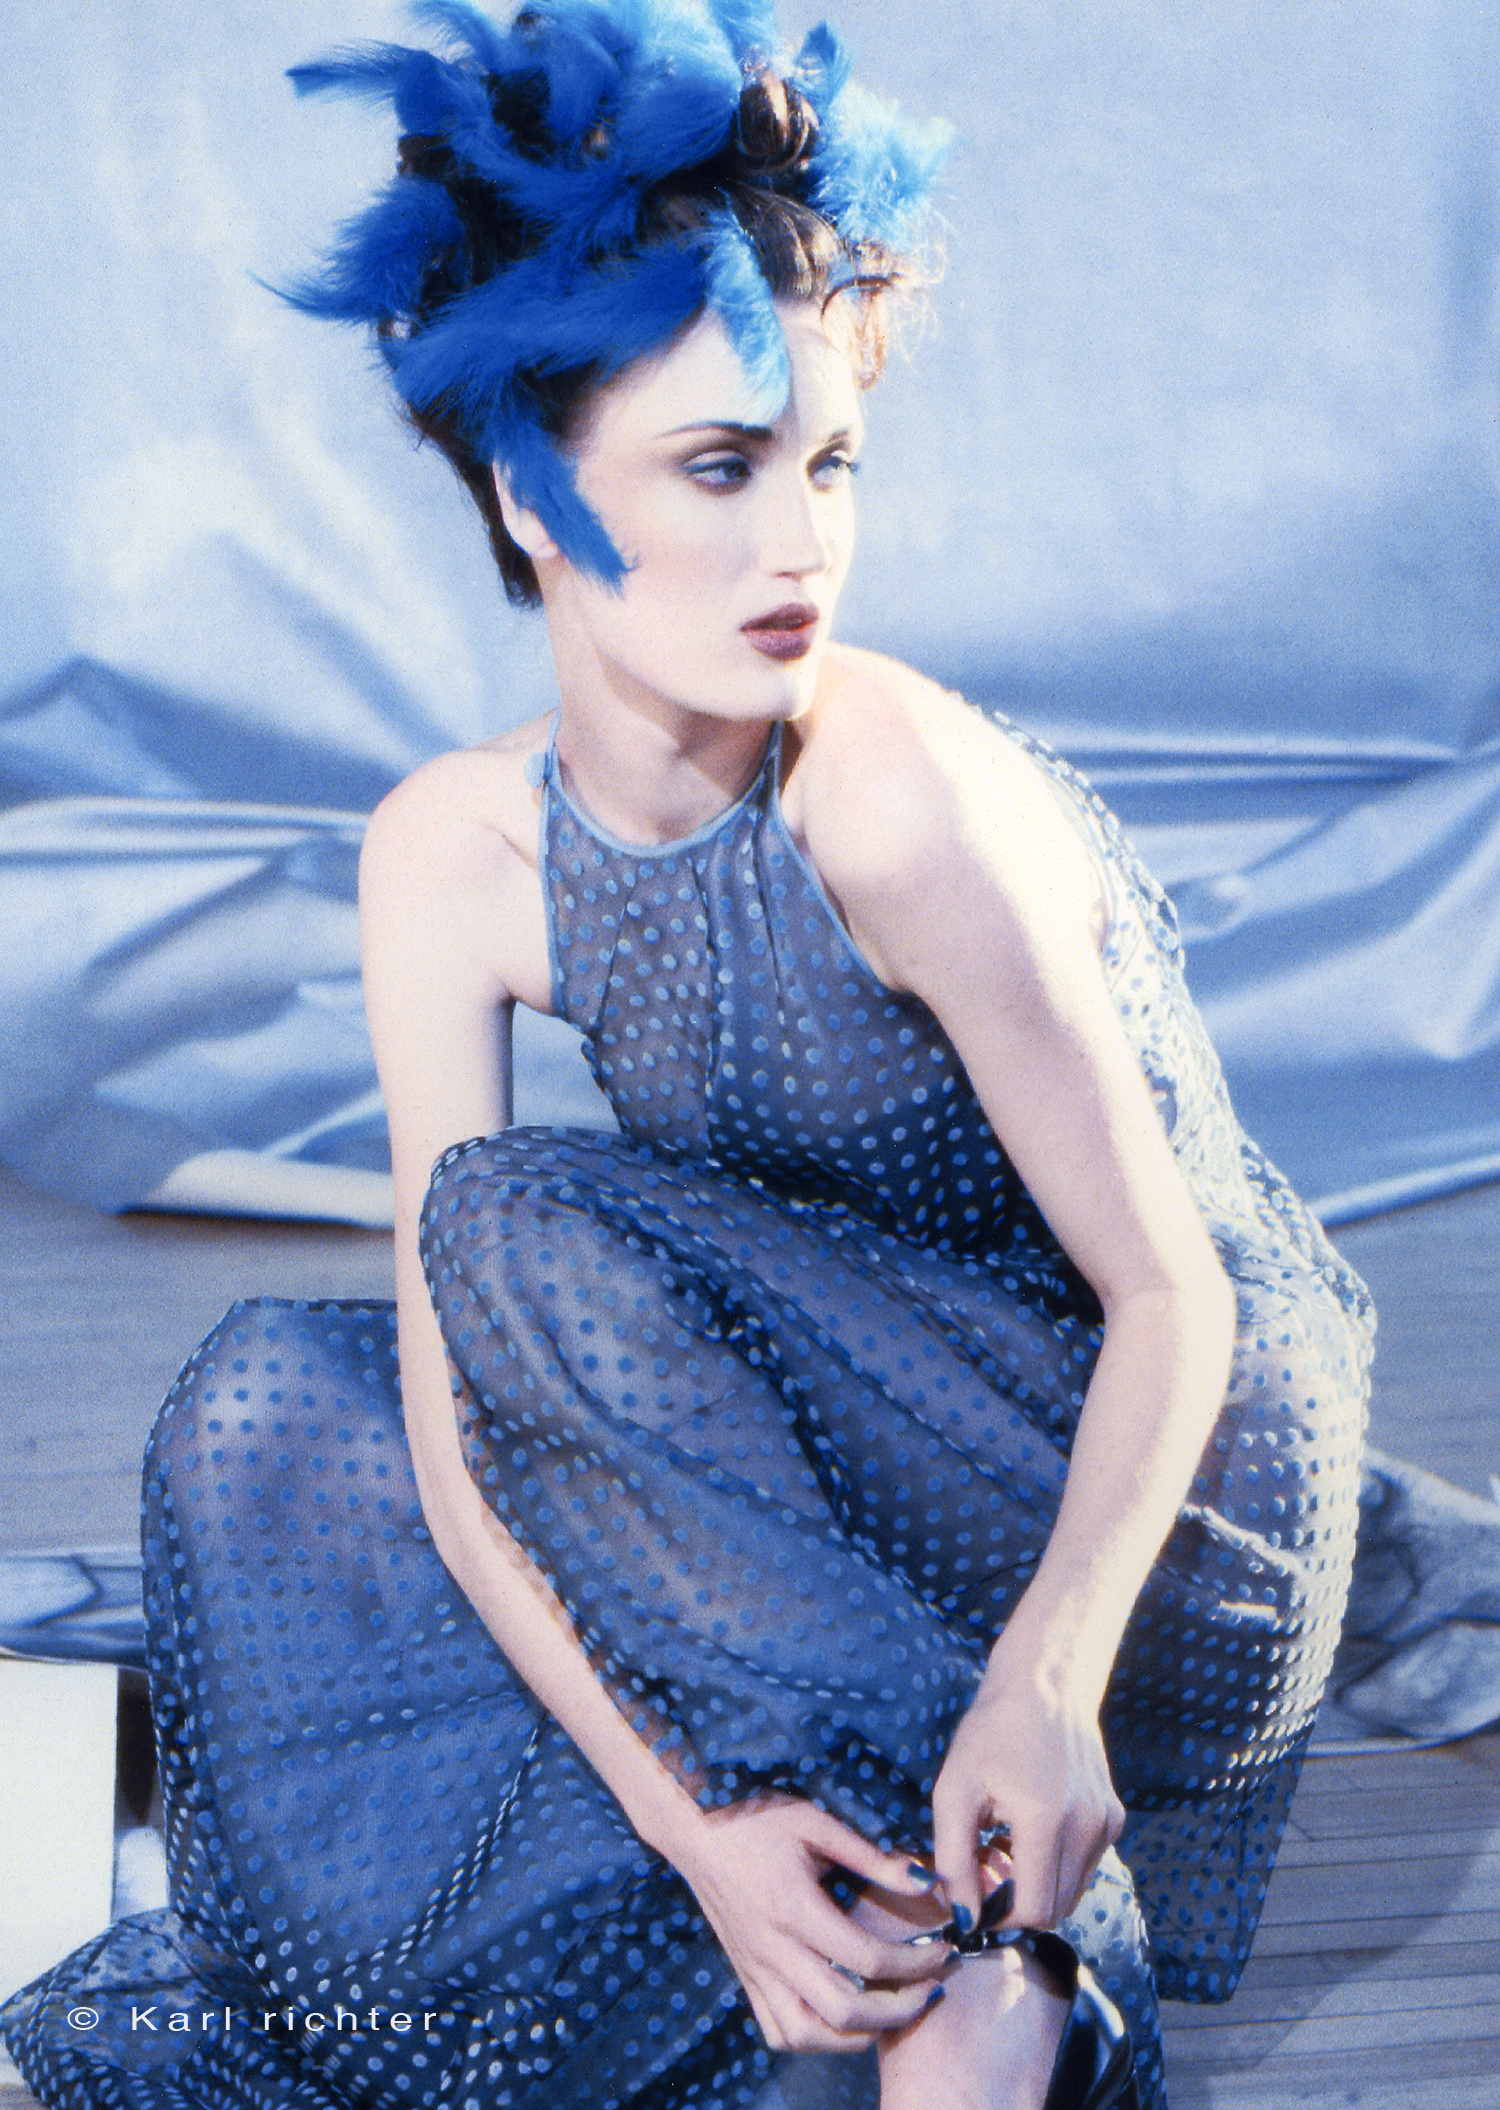 Lori S in blue feathers